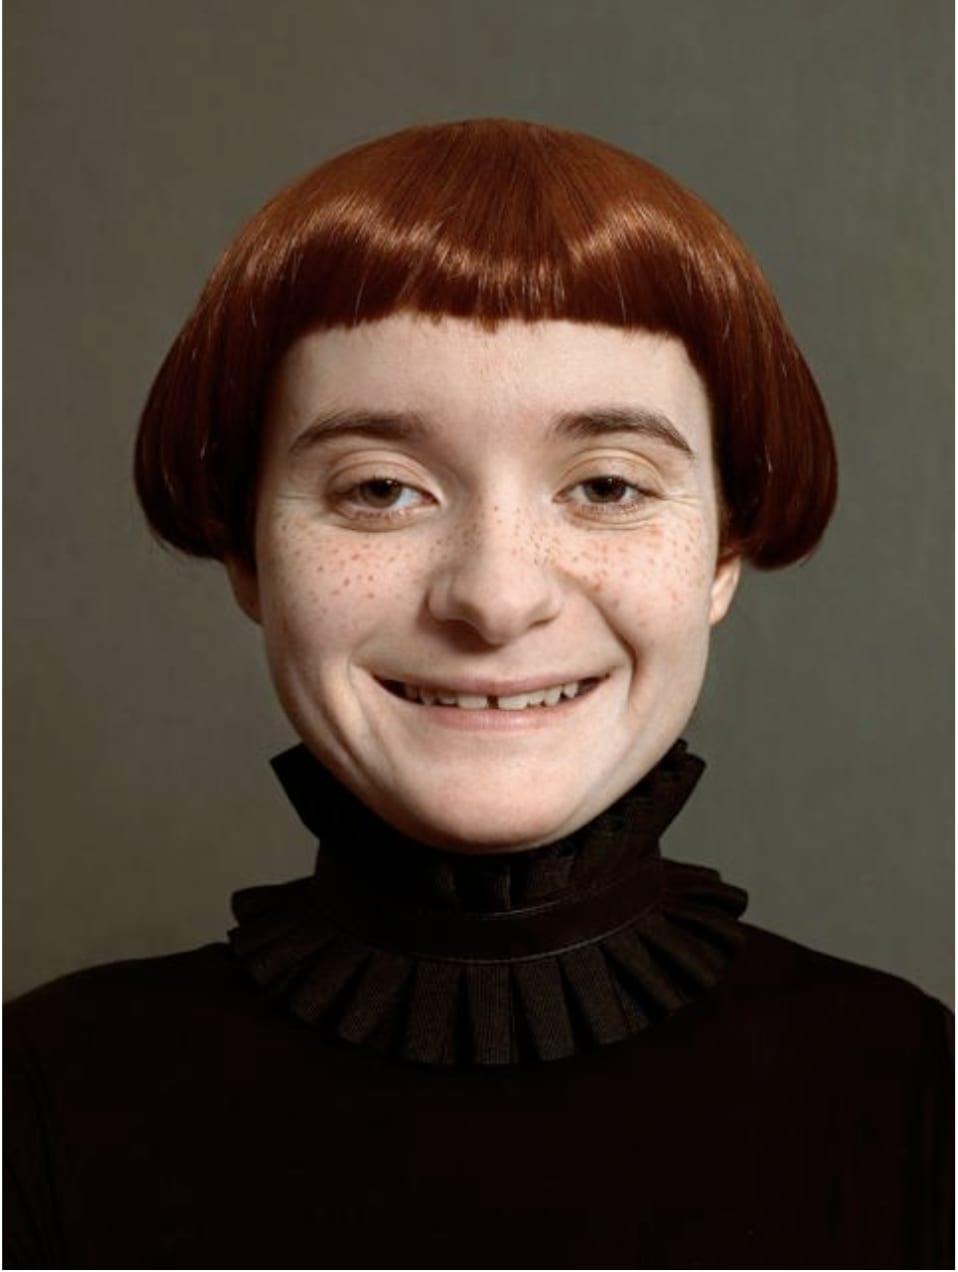 Romina Ressia, Ginger Smile